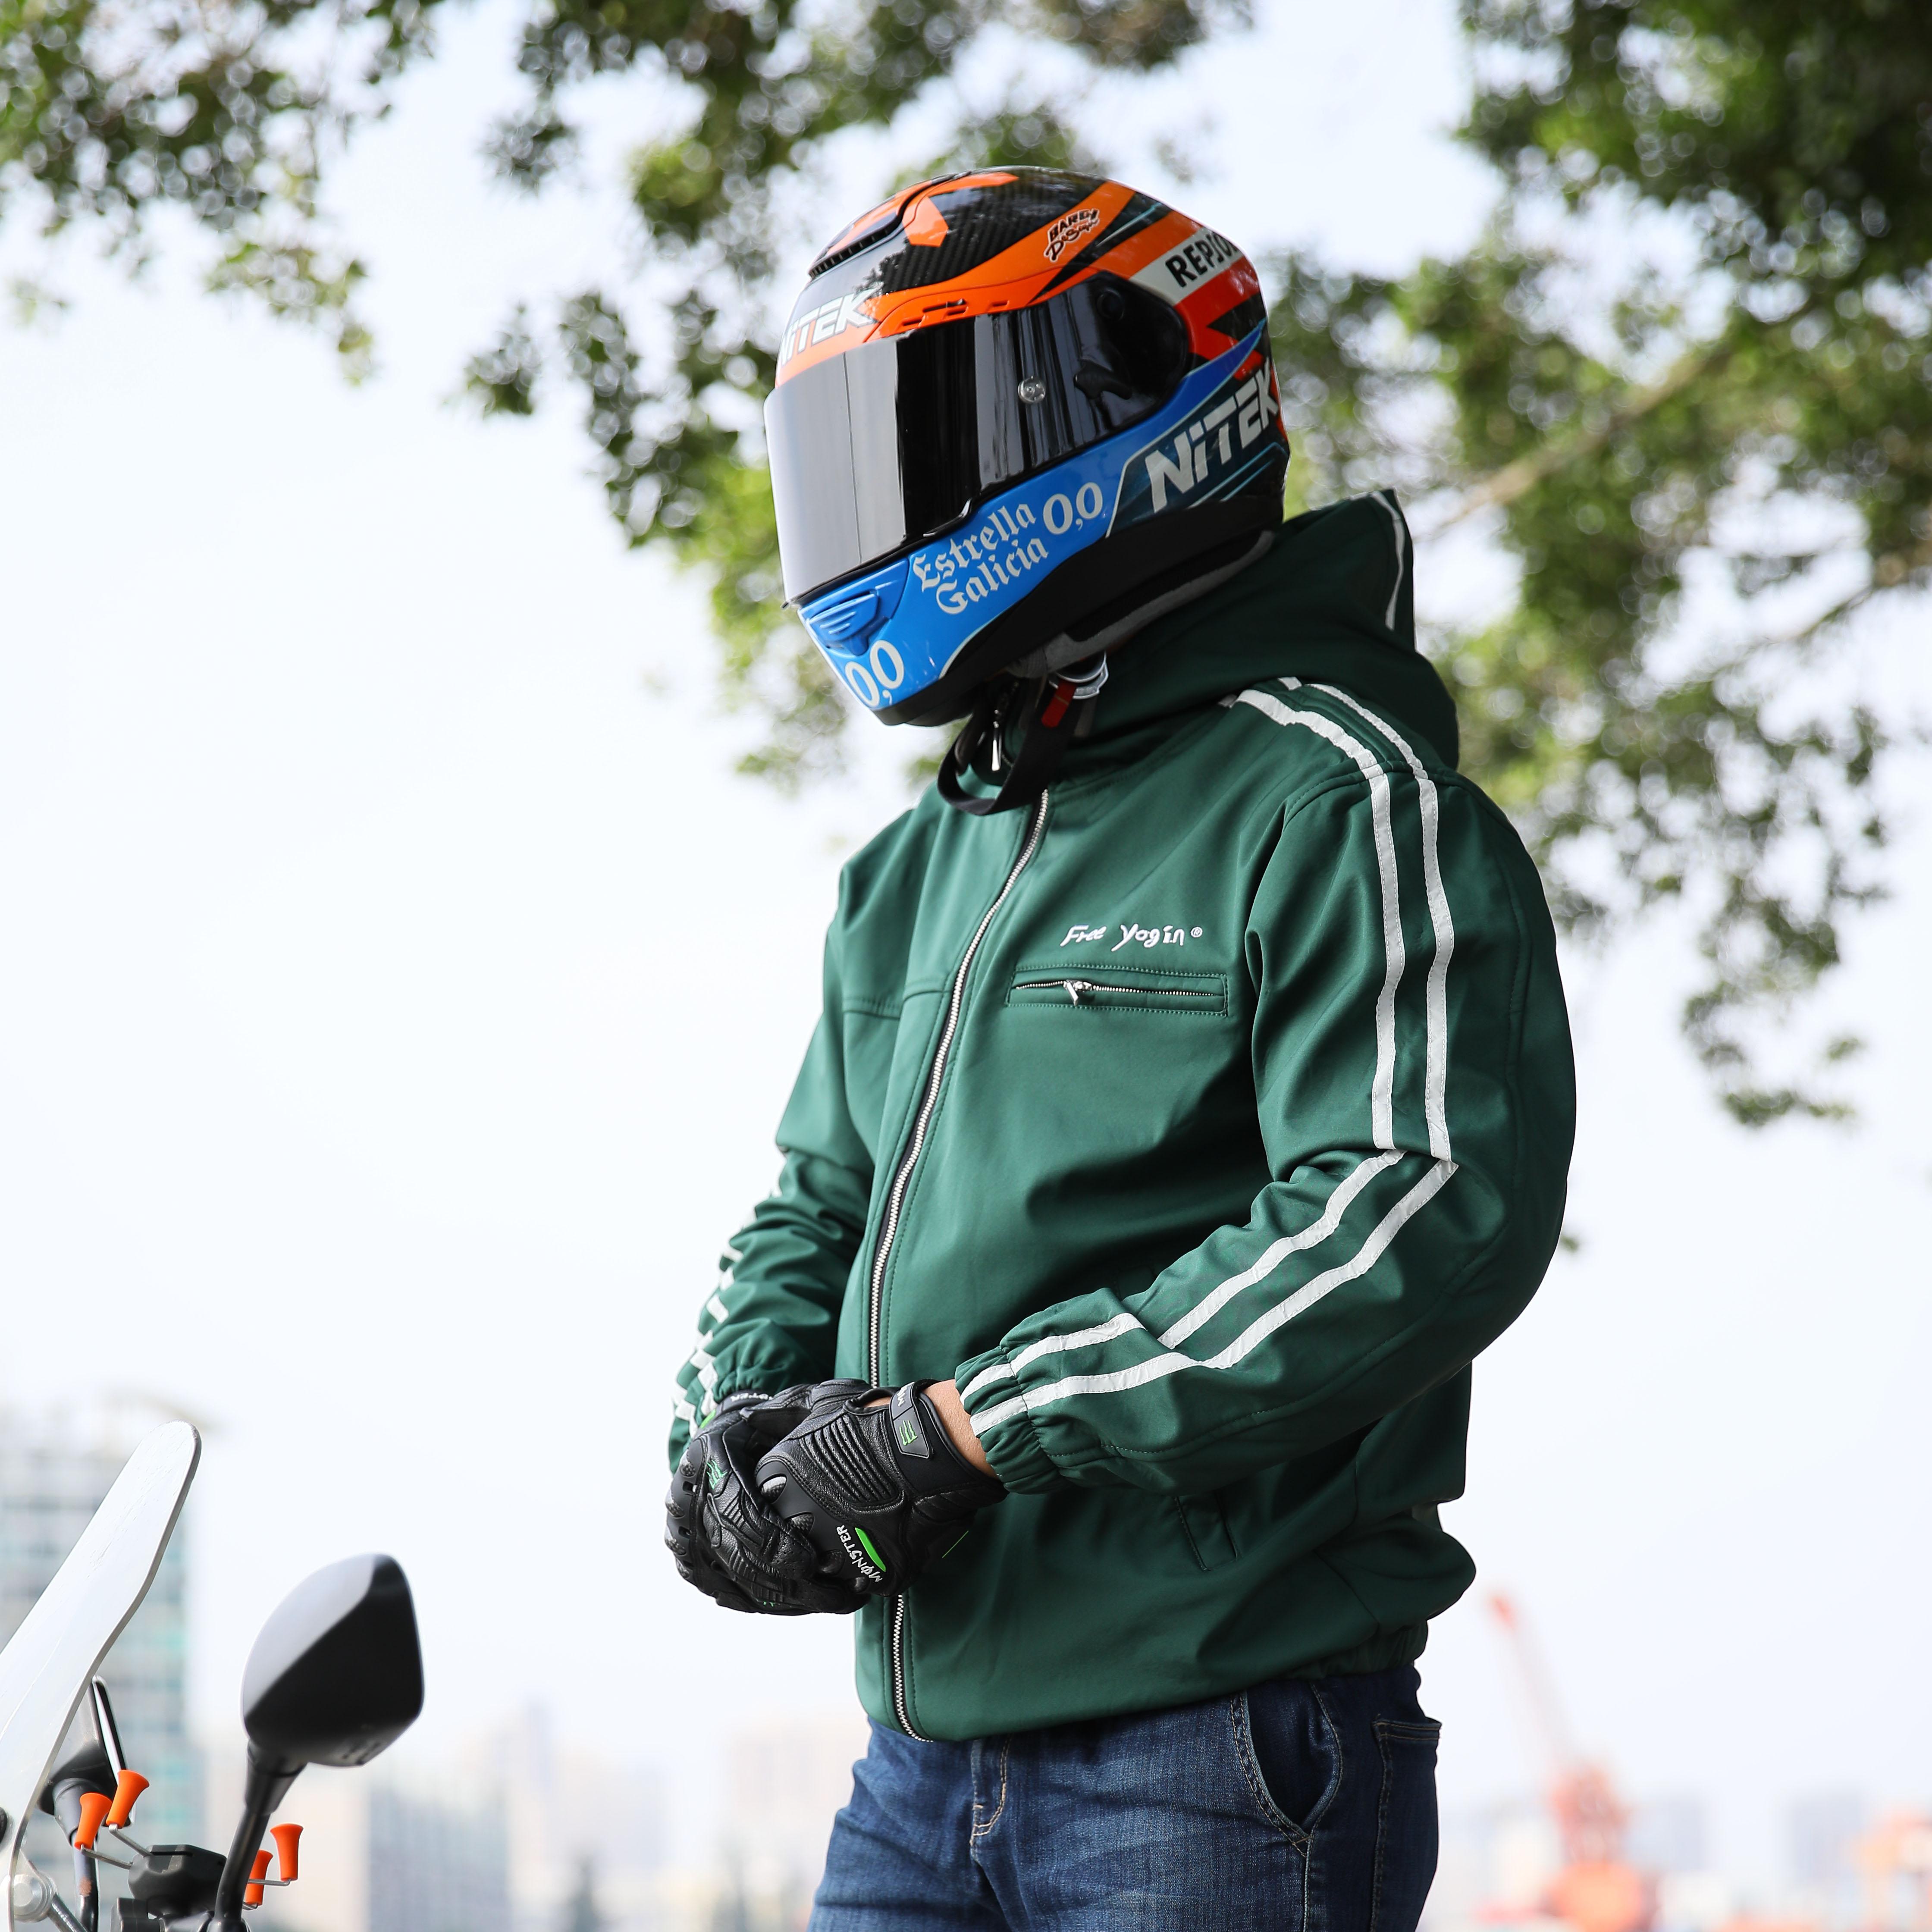 FREEYOGIN摩托车骑行服男休闲卫衣外套防摔防风通勤机车夹克绿色